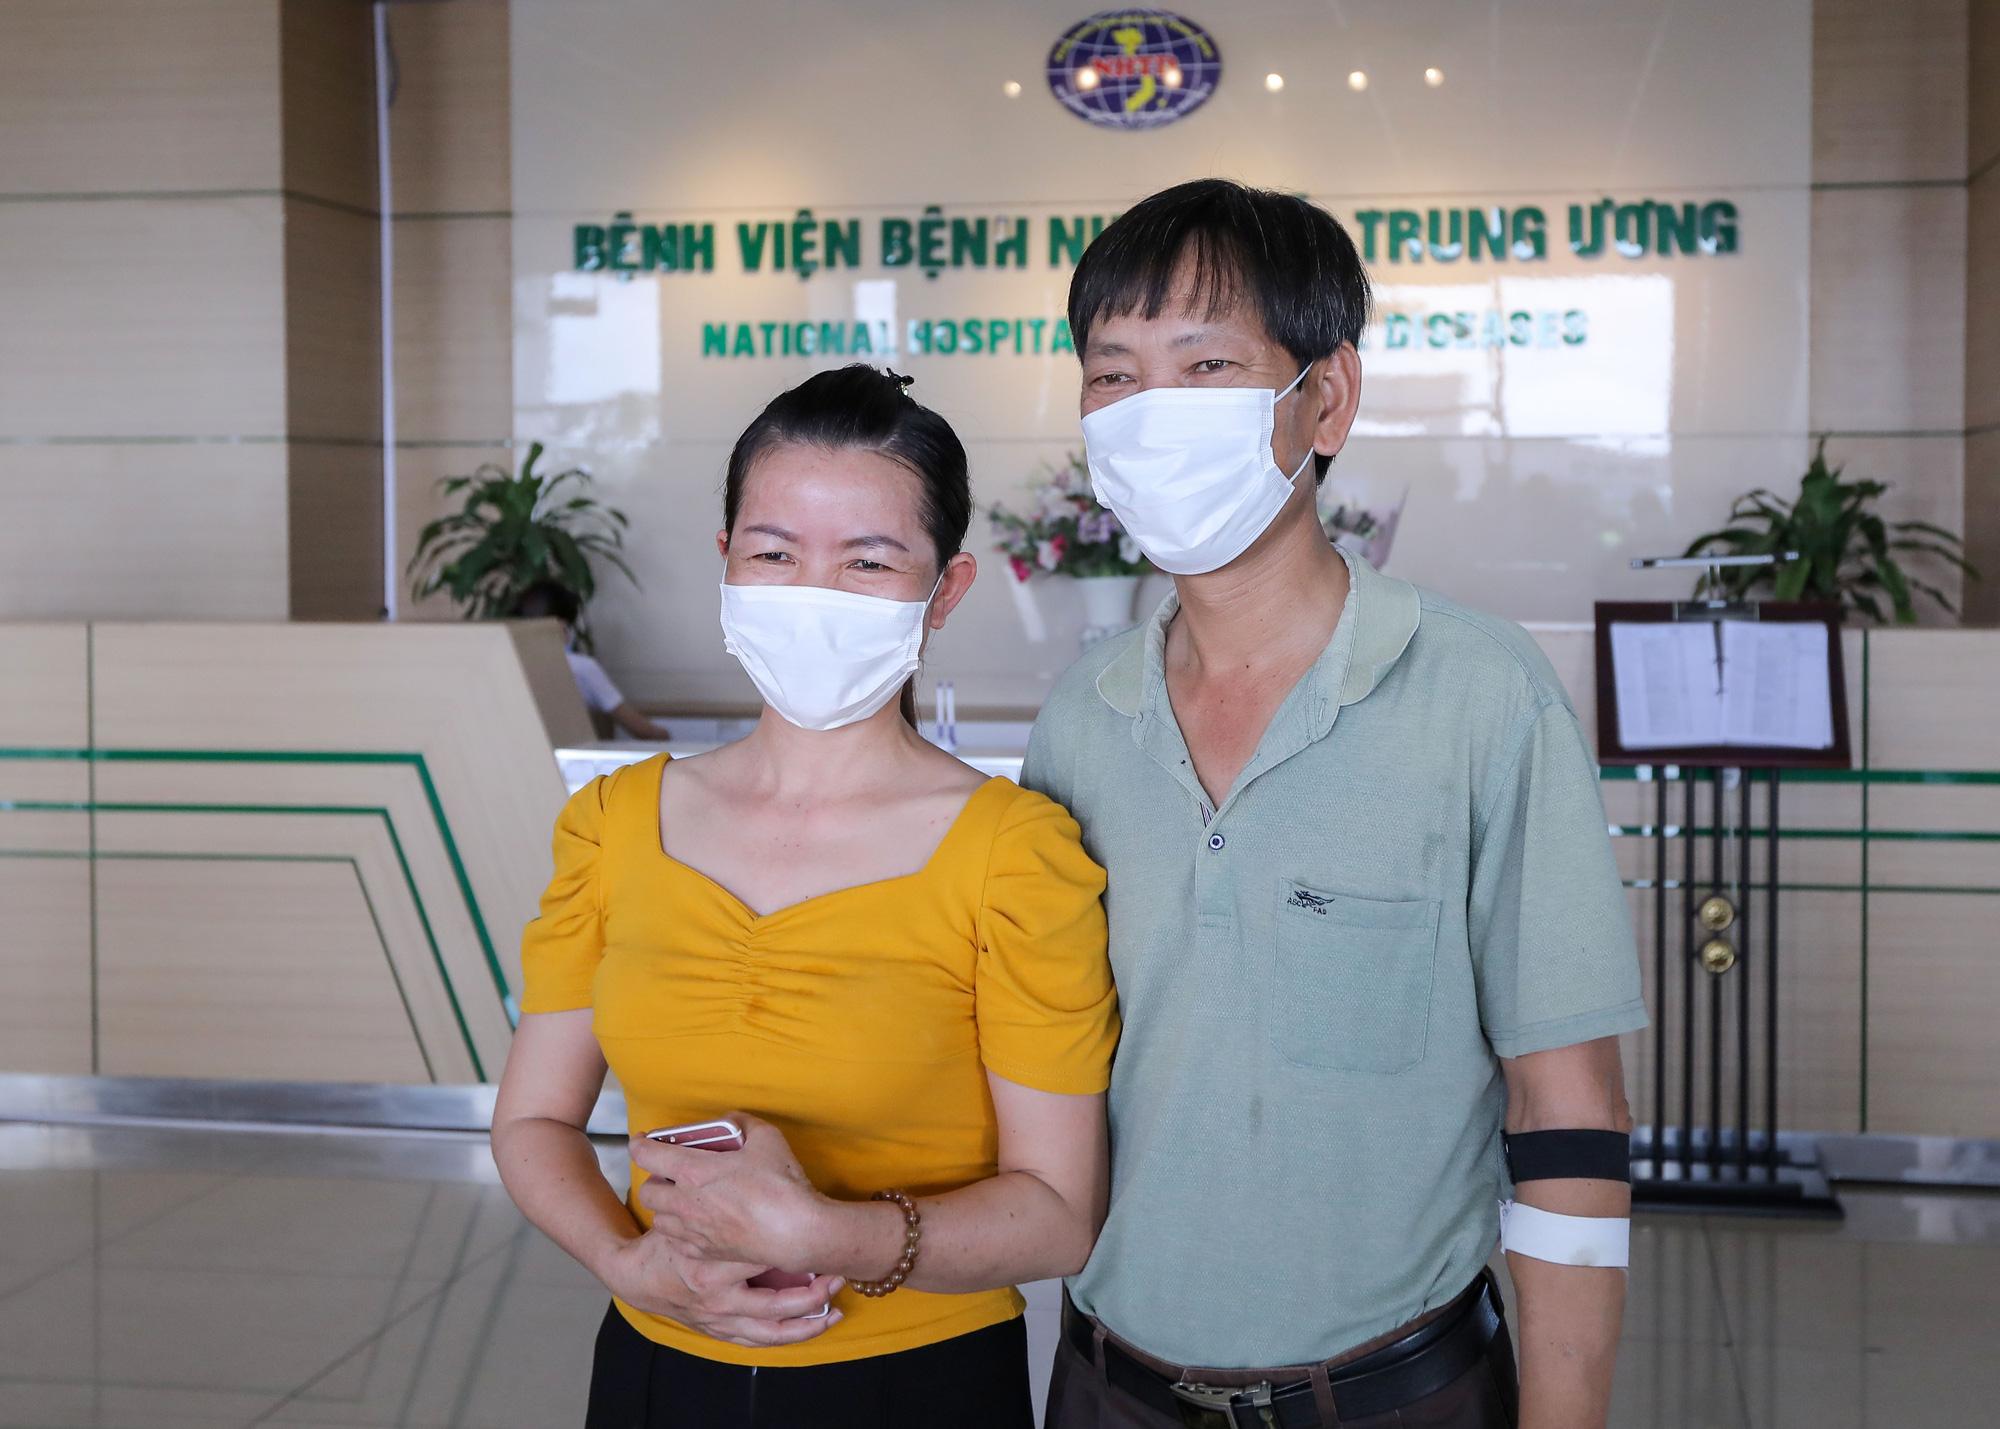 Brazilian citizens who retested positive for COVID-19 recover in Vietnam